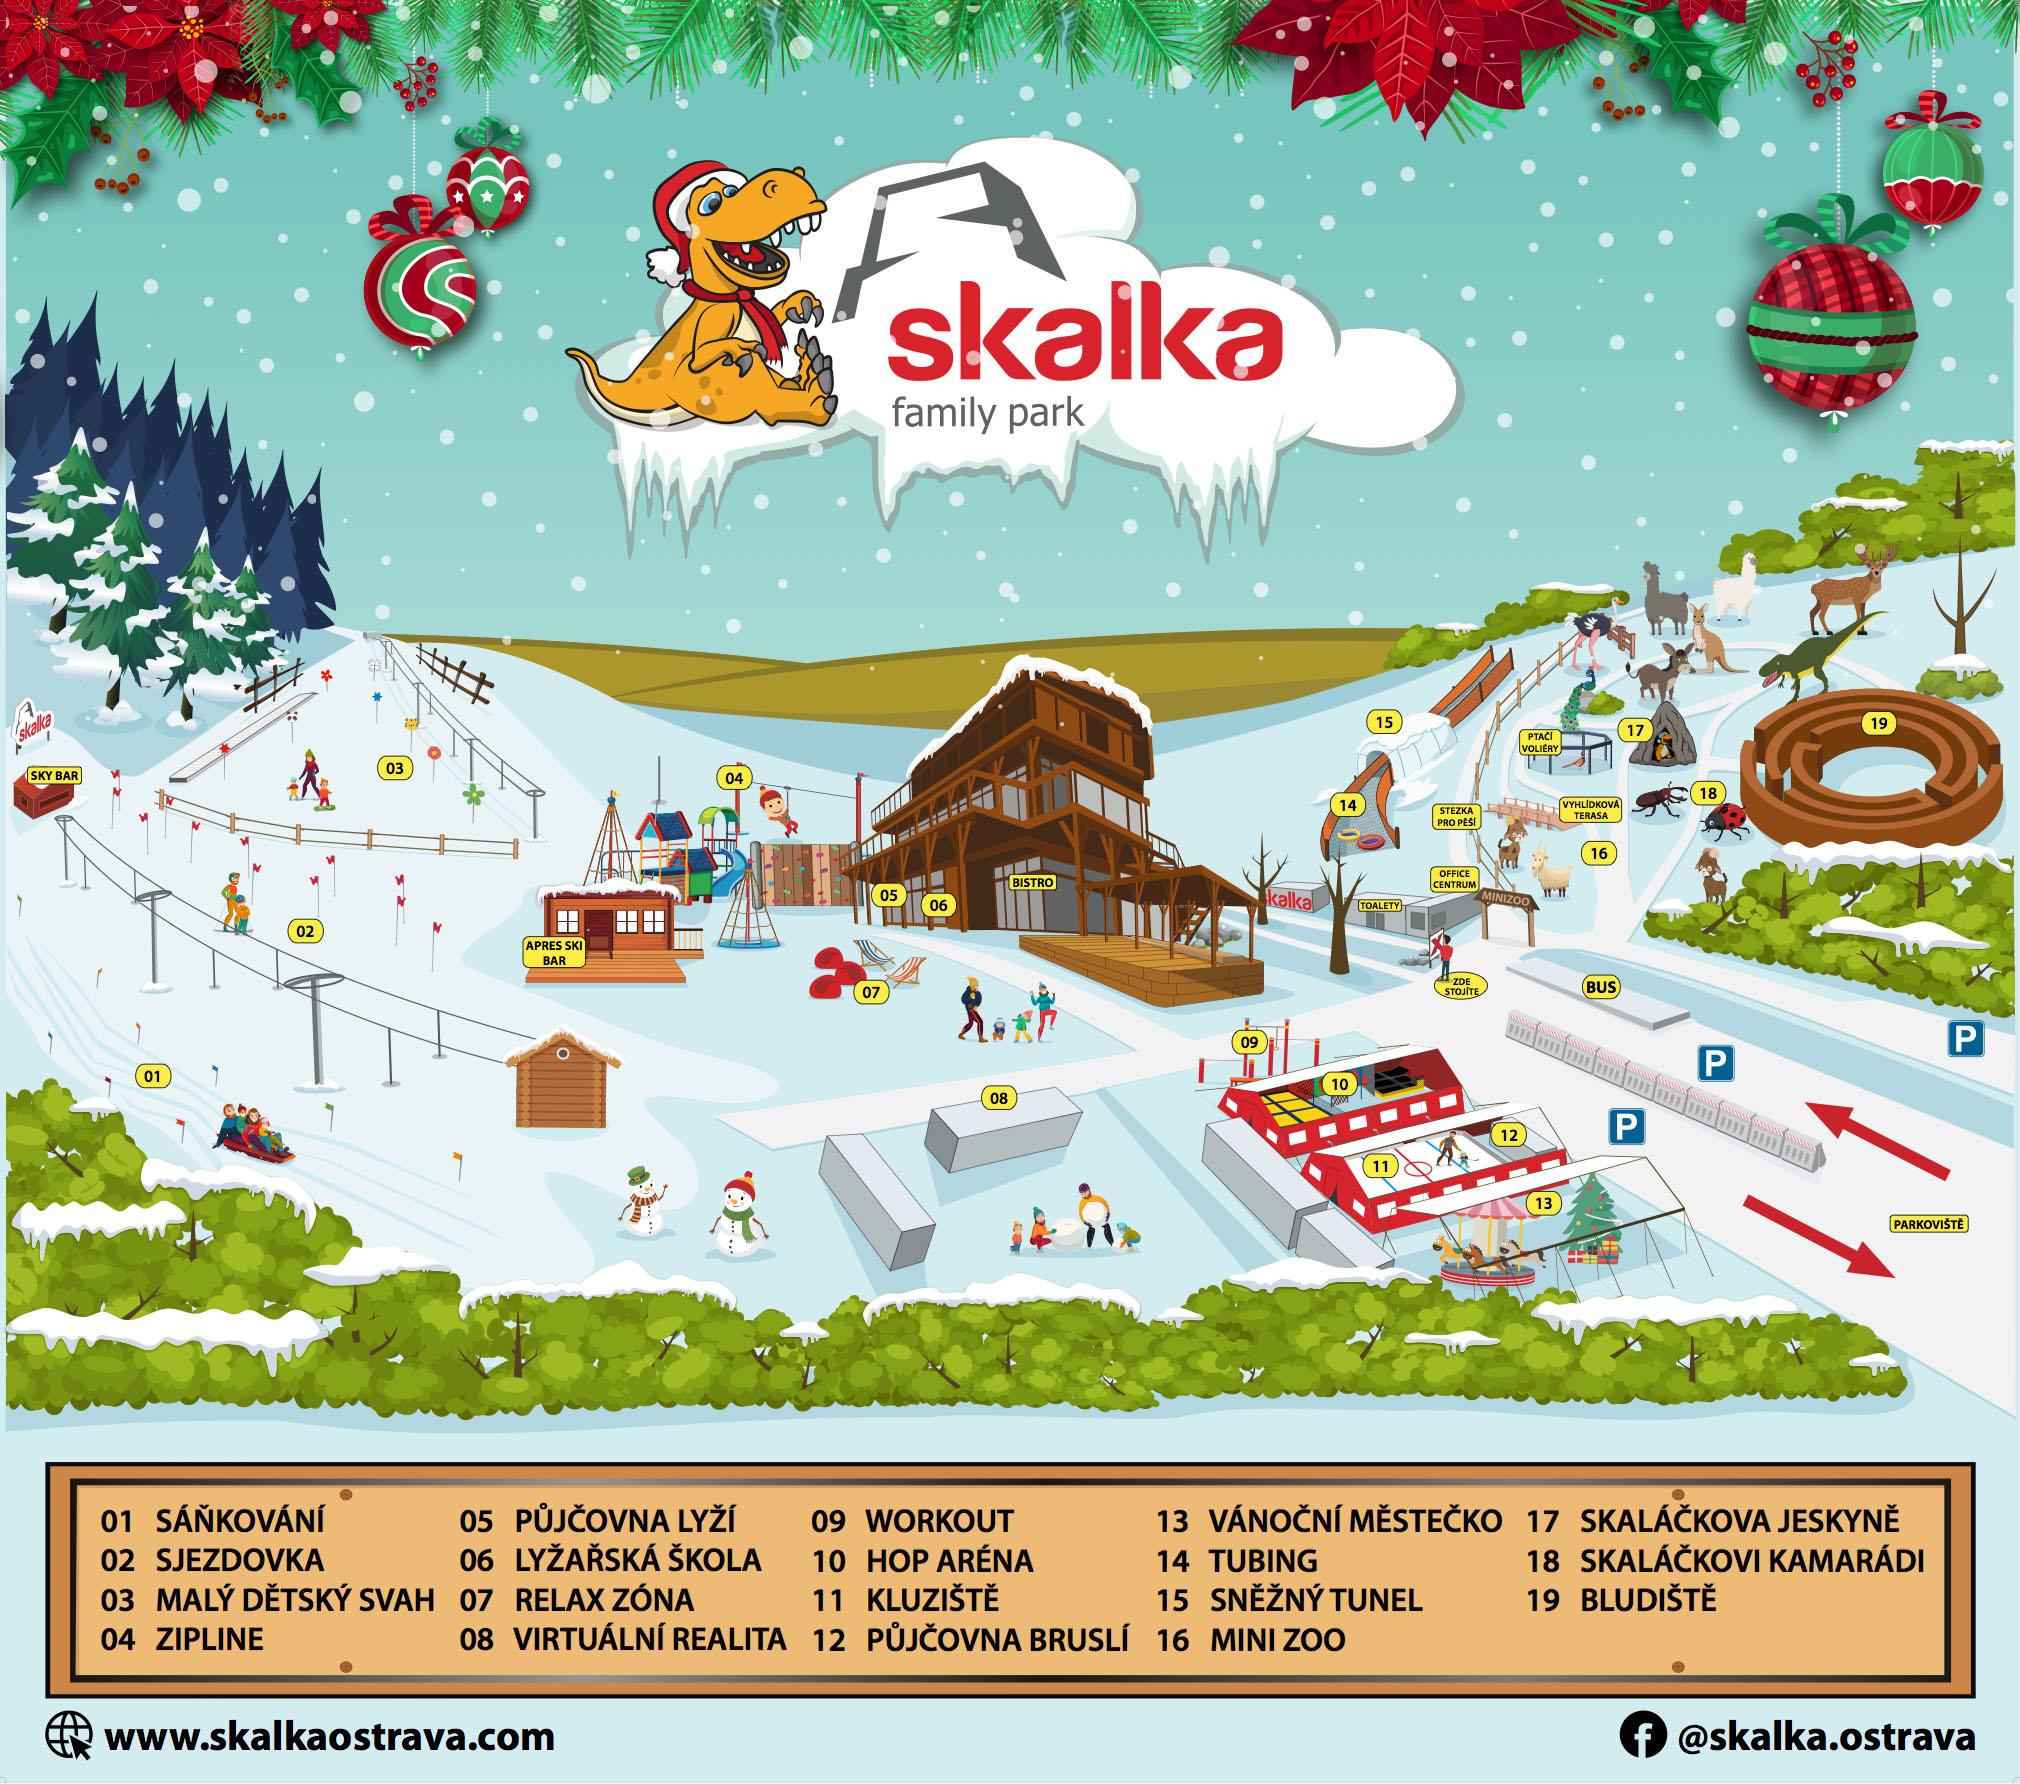 Zimní aktivity - Skalka family park Ostrava